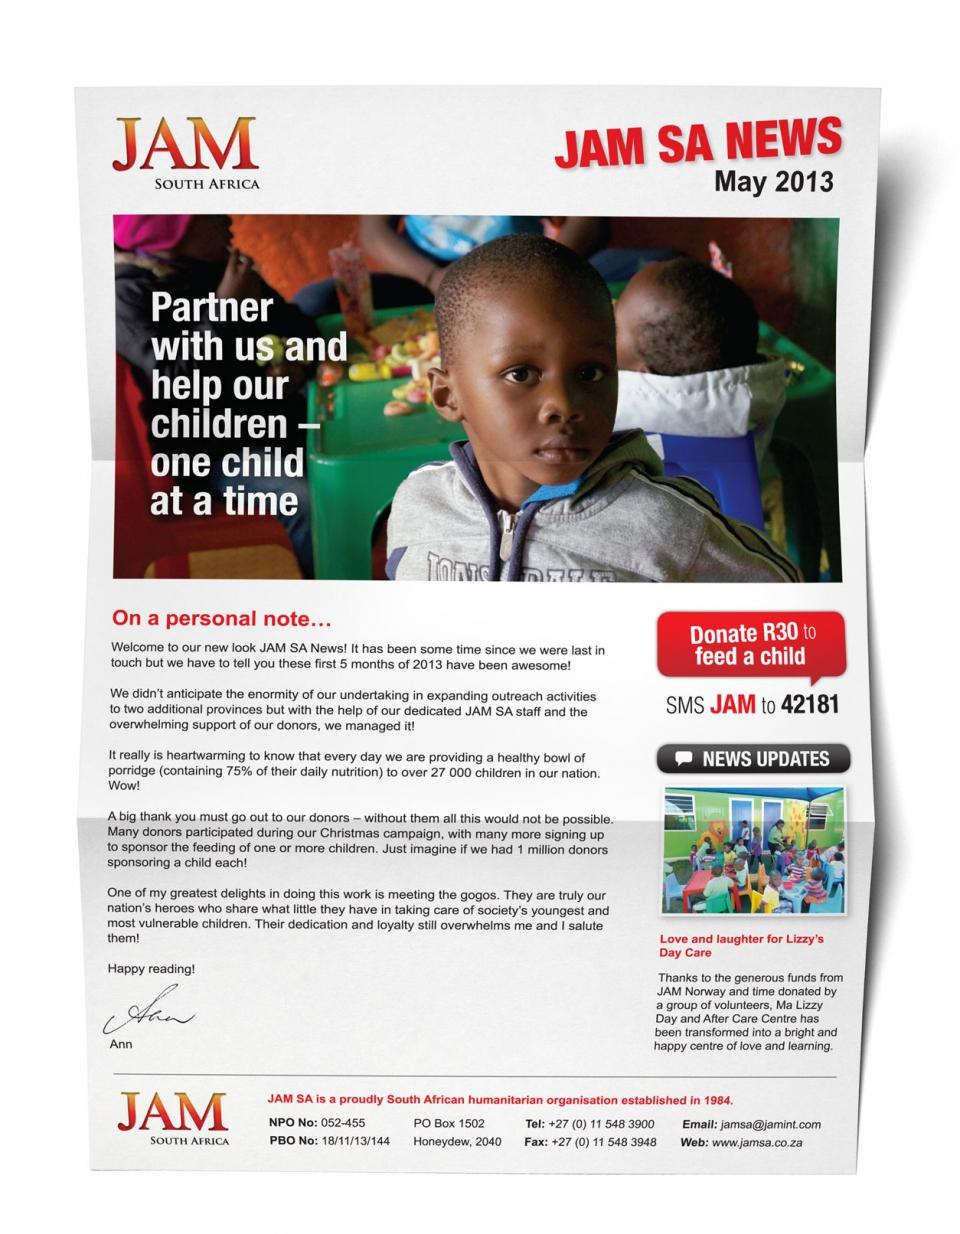 jam-news-2